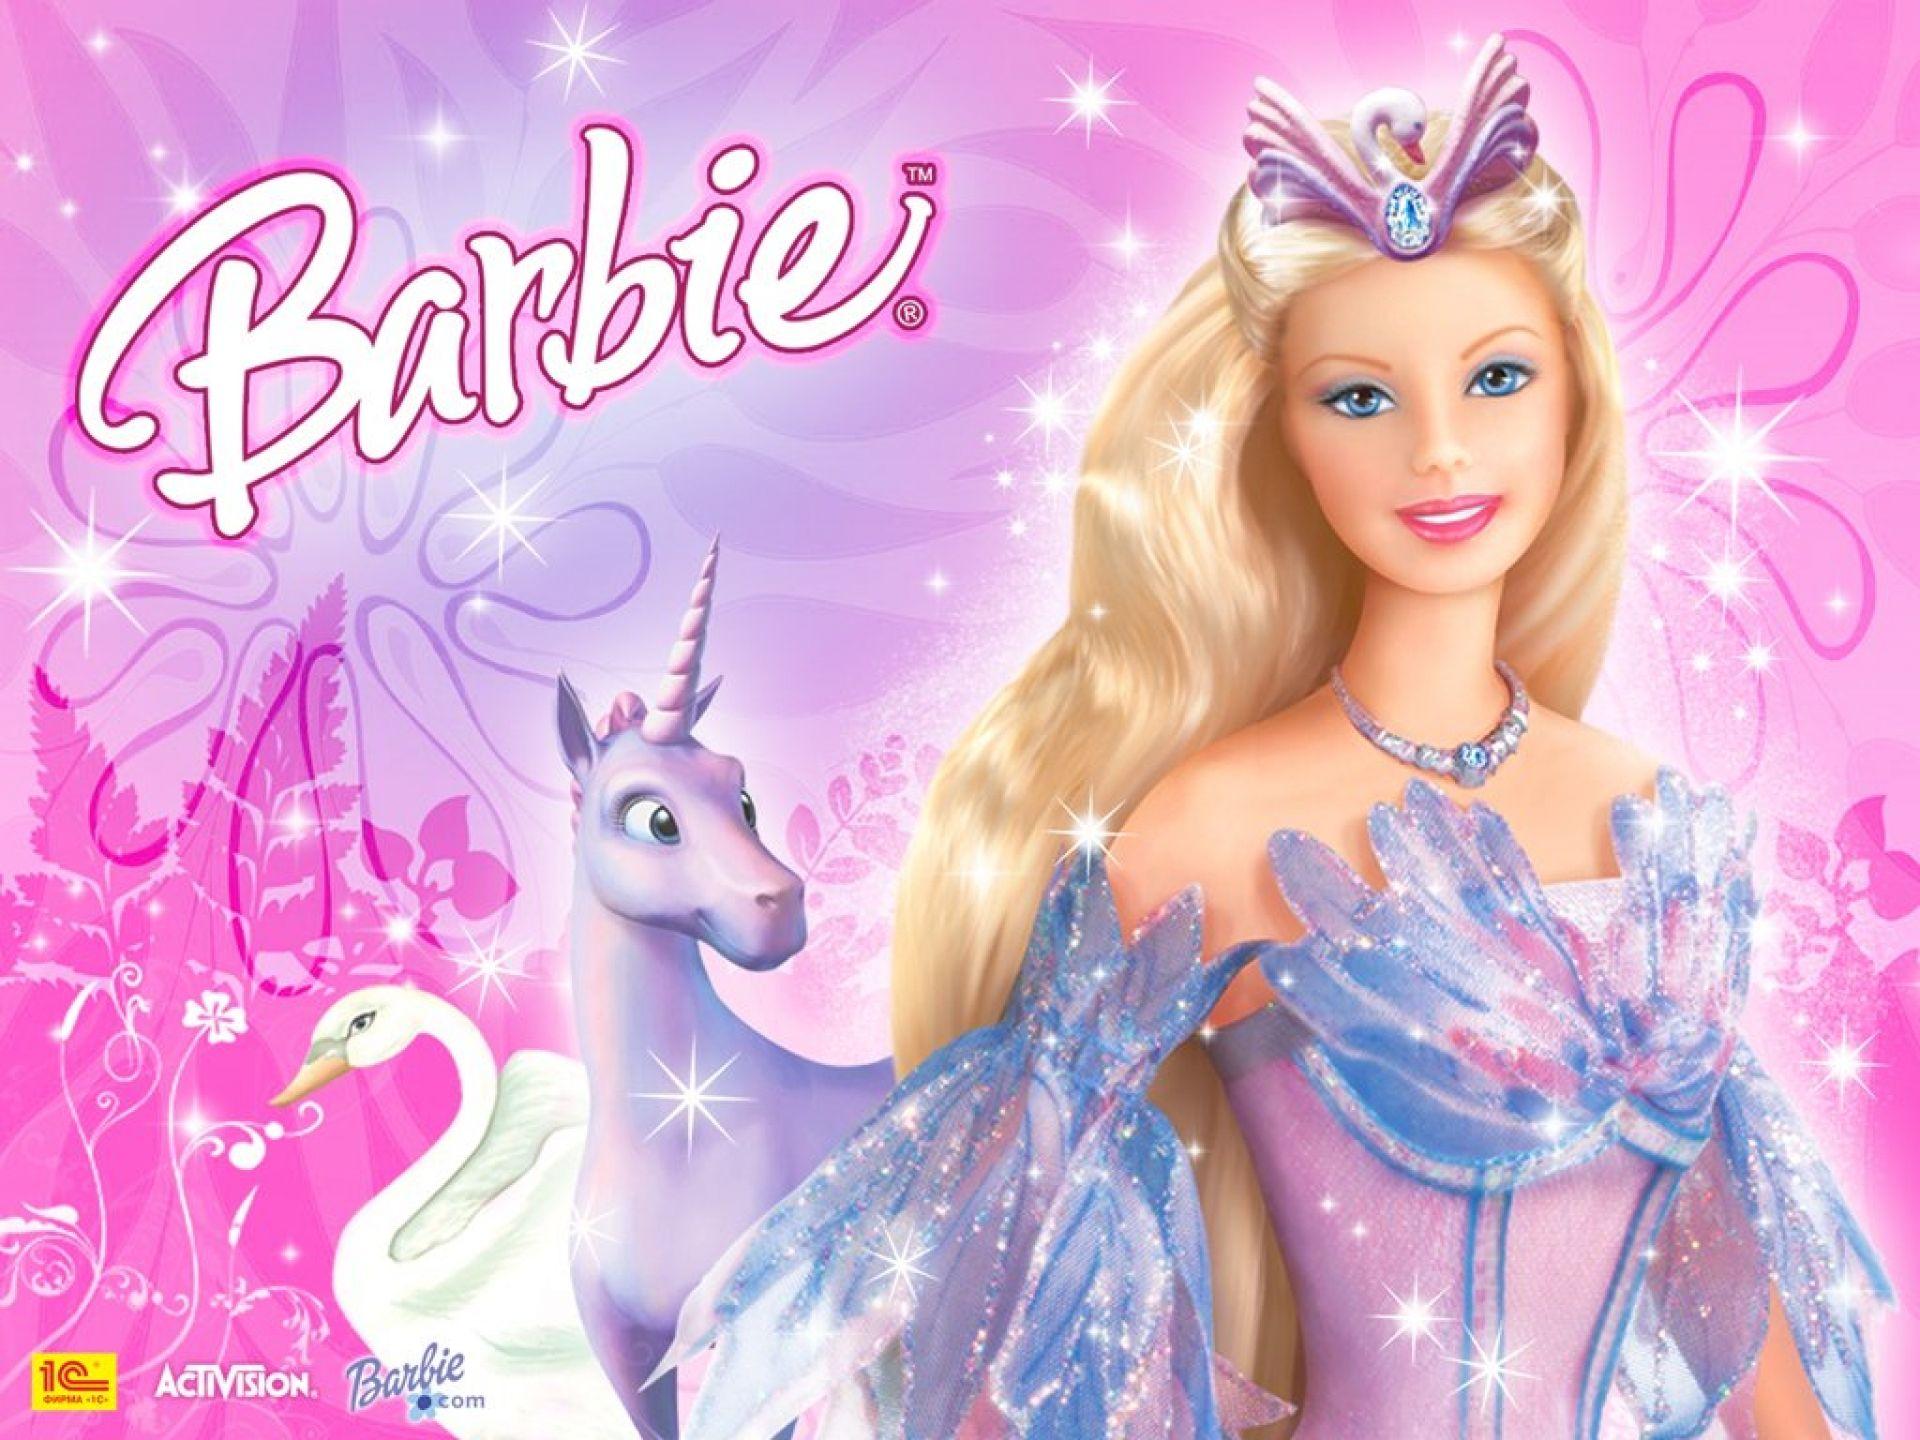 Barbie Cartoon Barbie and swan barbiemania barbie games